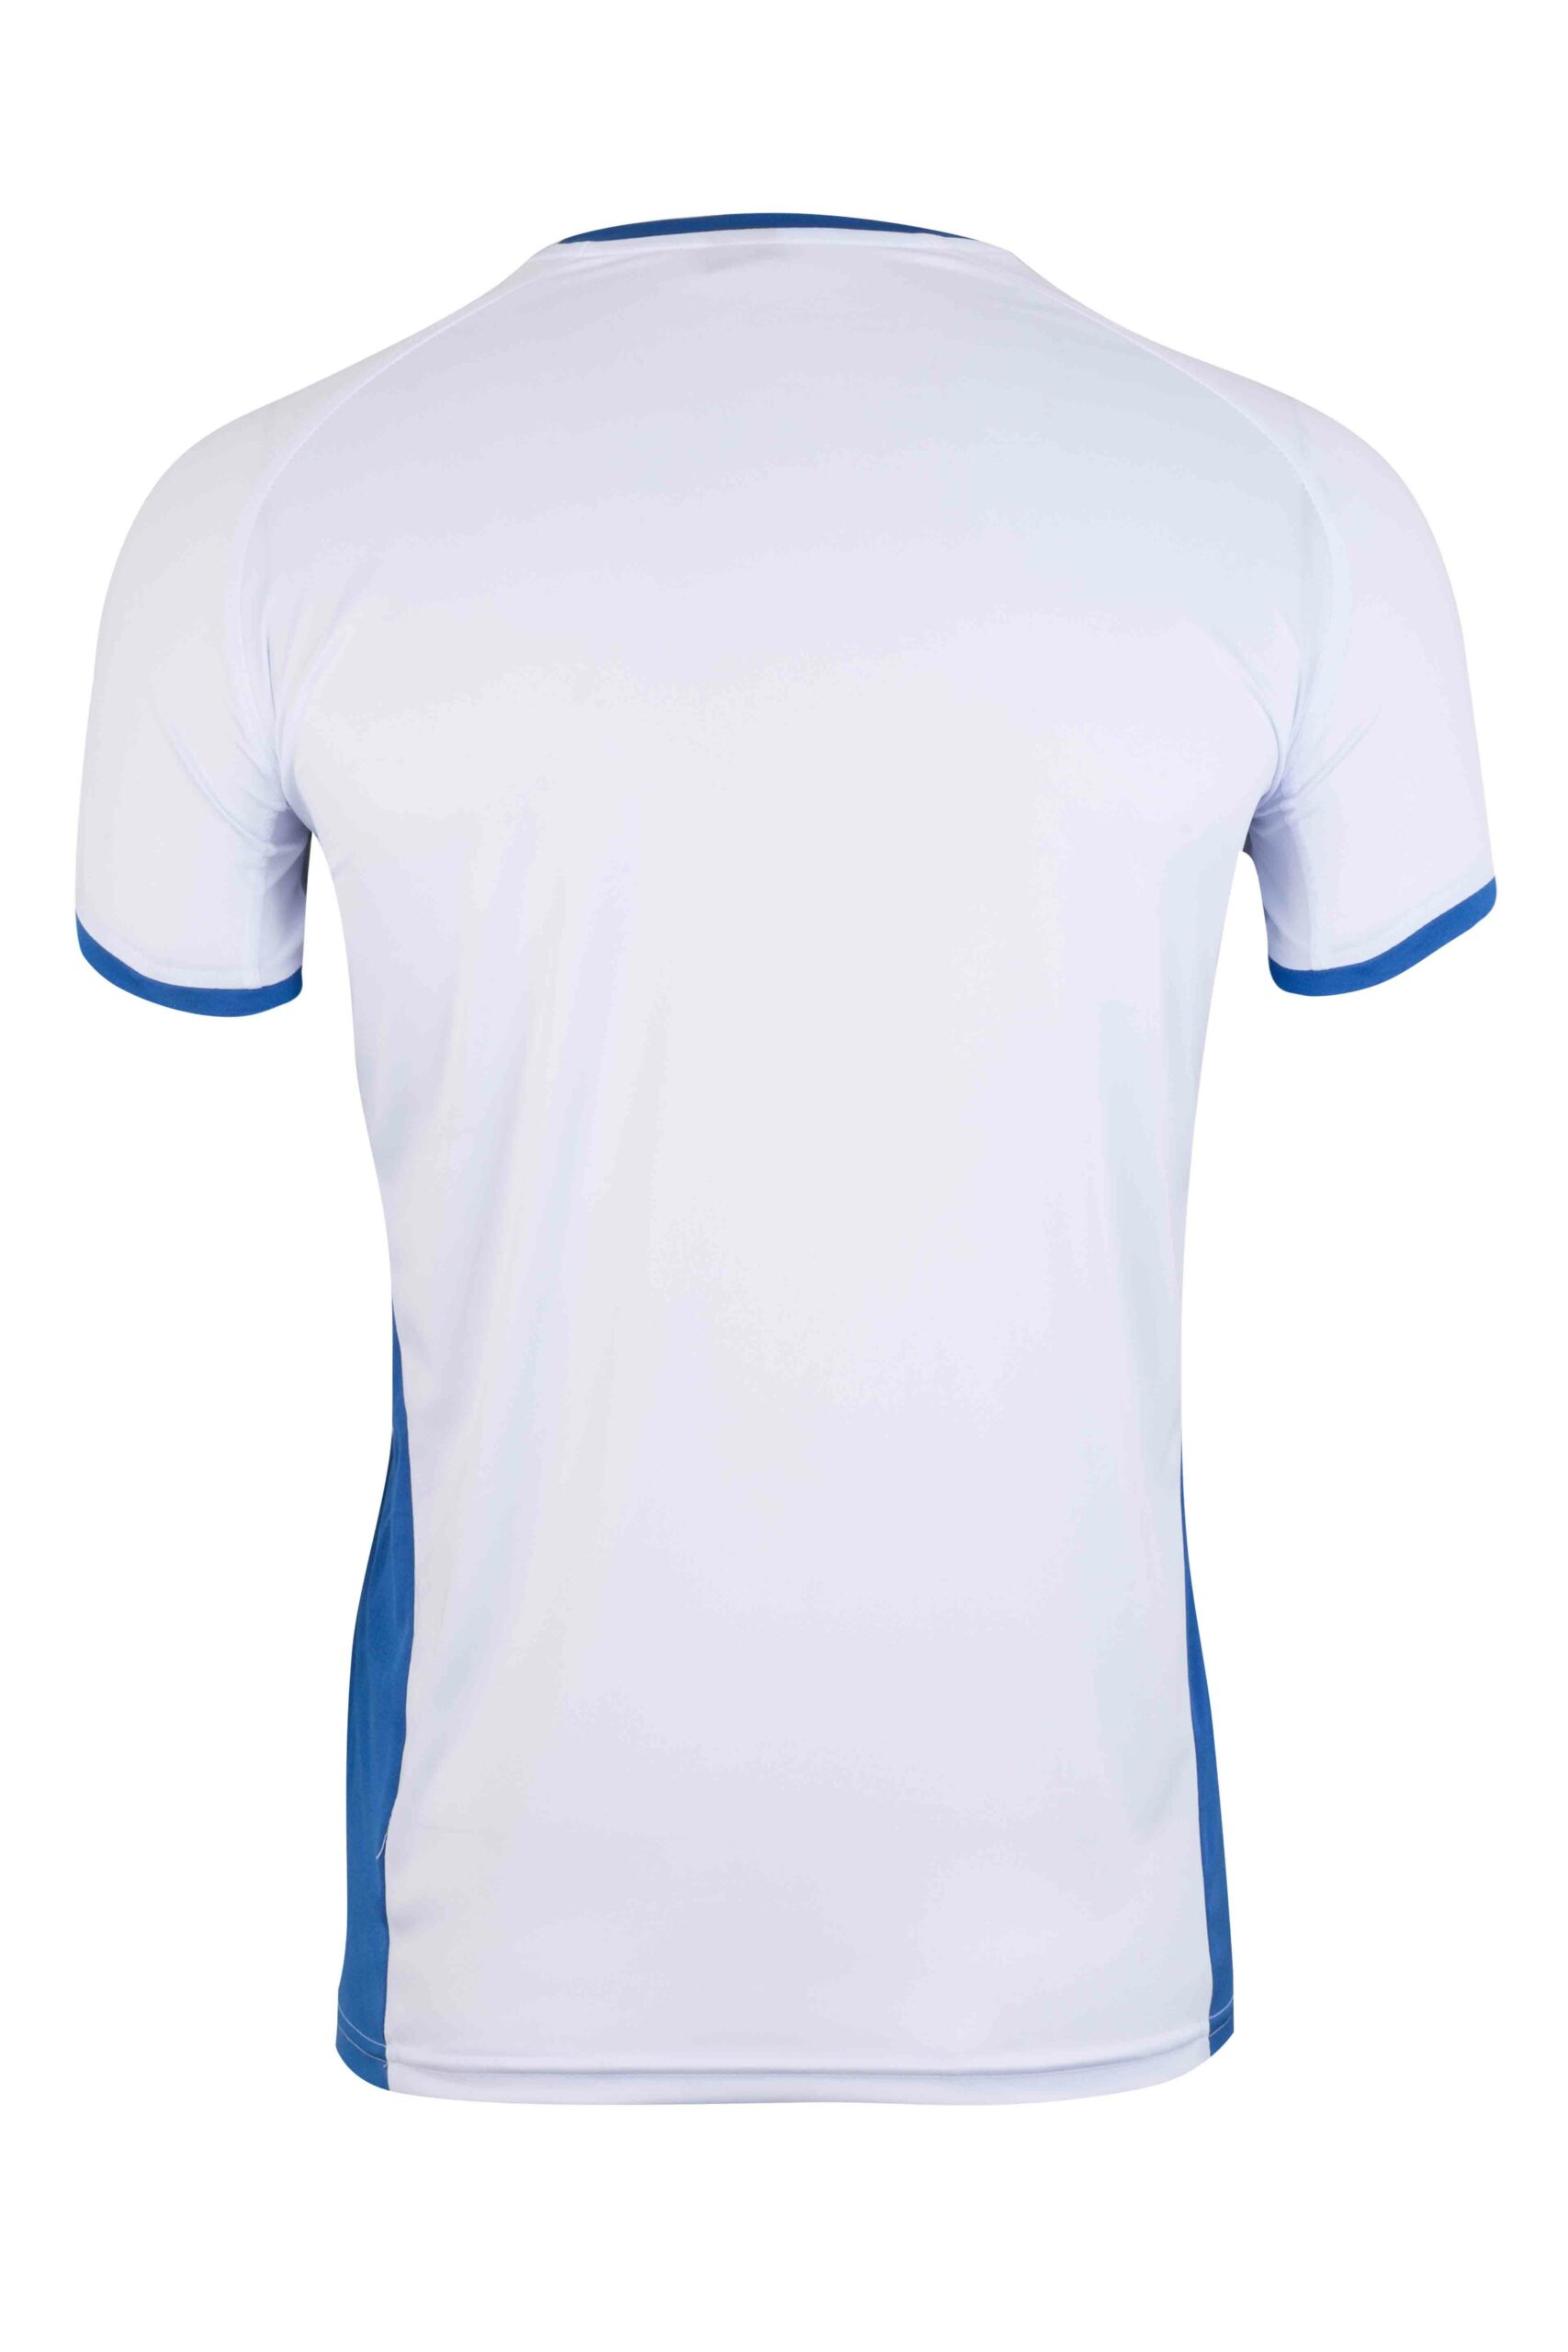 Mukua Mk530v Mukua Camiseta TÉcnica Manga Corta Bicolor White Royal Blue 2